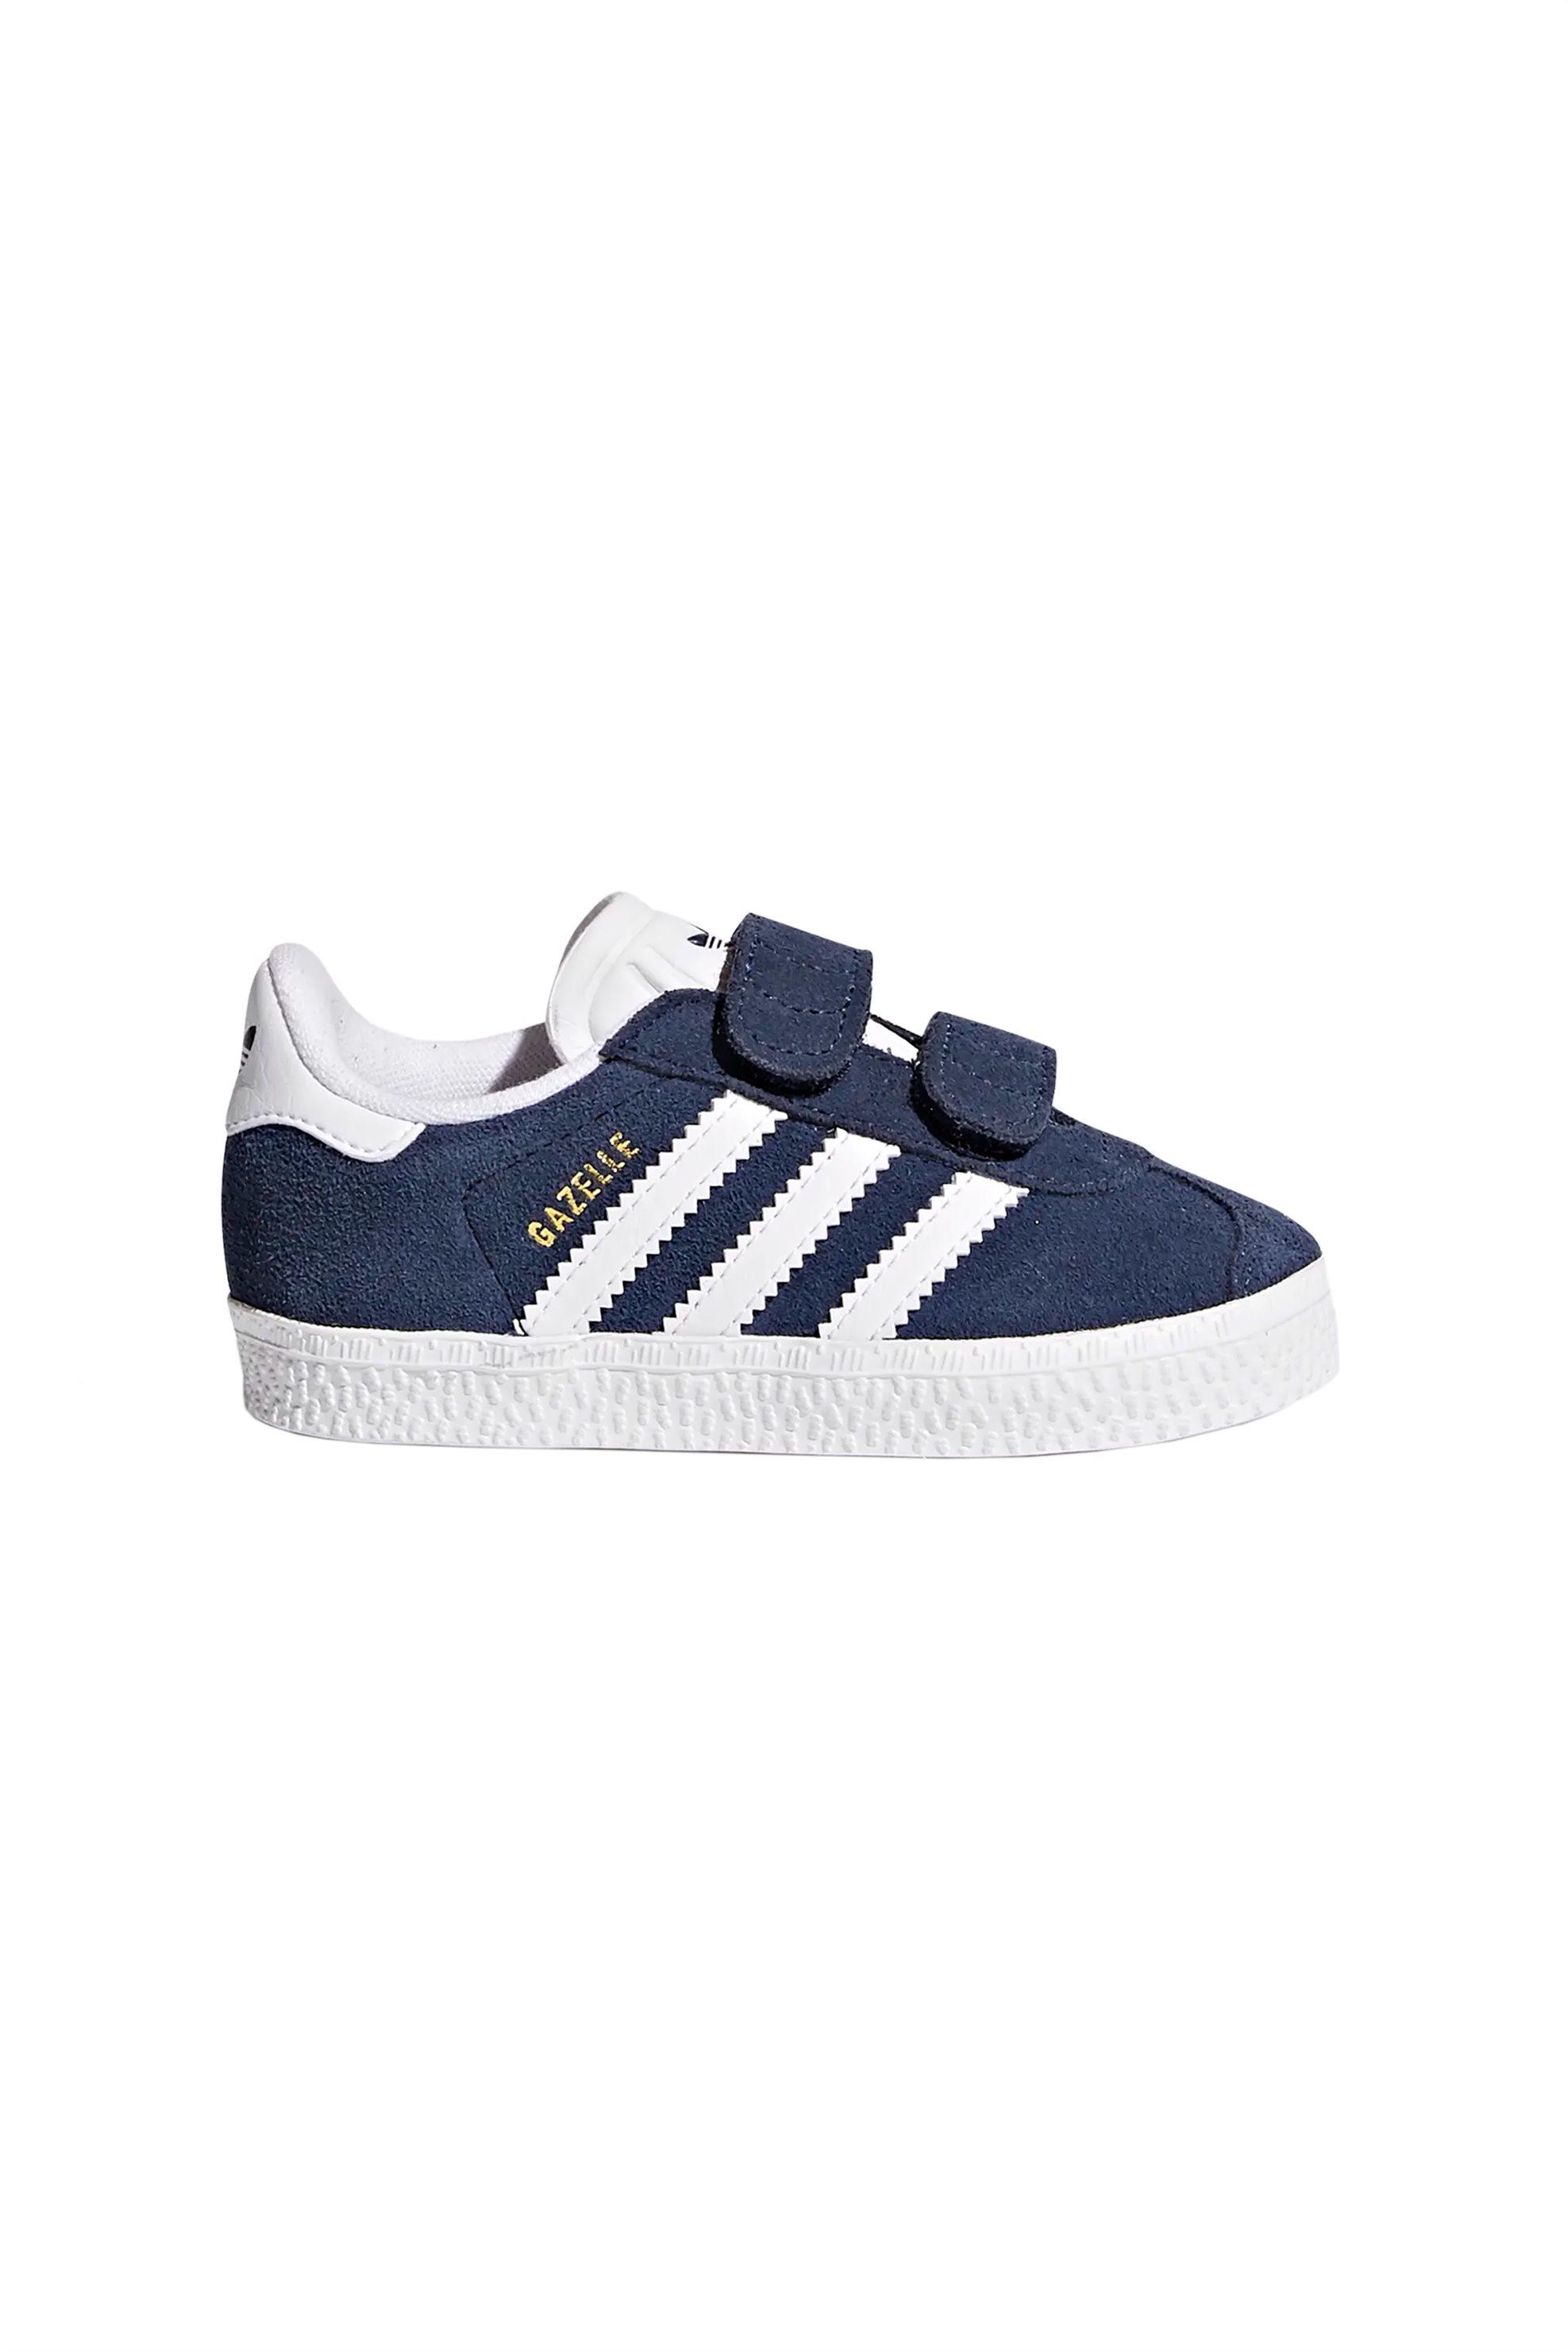 1079b4bbaba Notos Adidas βρεφικά αθλητικά παπούτσια Gazelle – CQ3138 – Μπλε Σκούρο